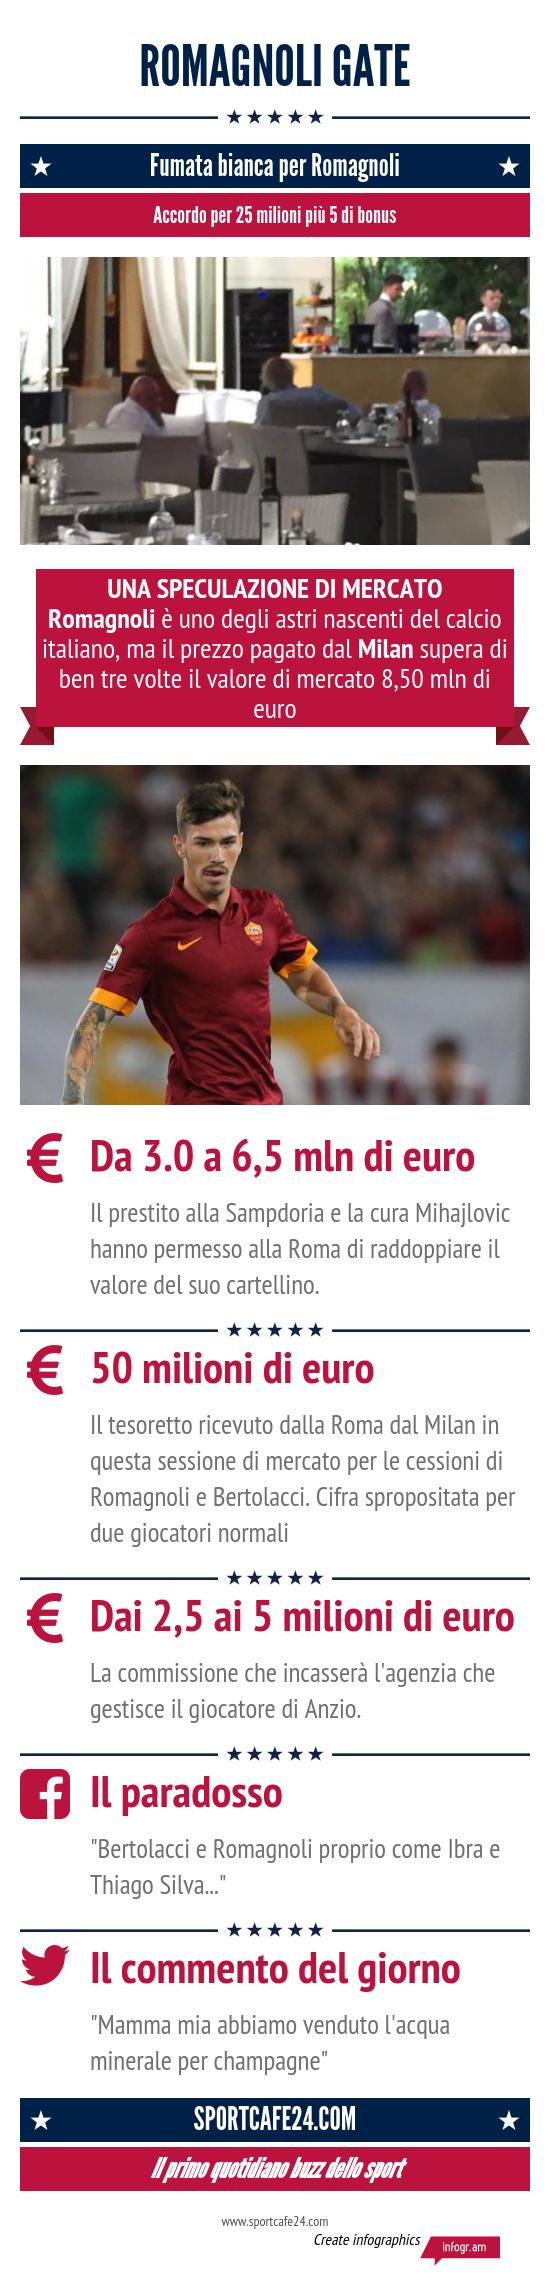 Info Romagnoli